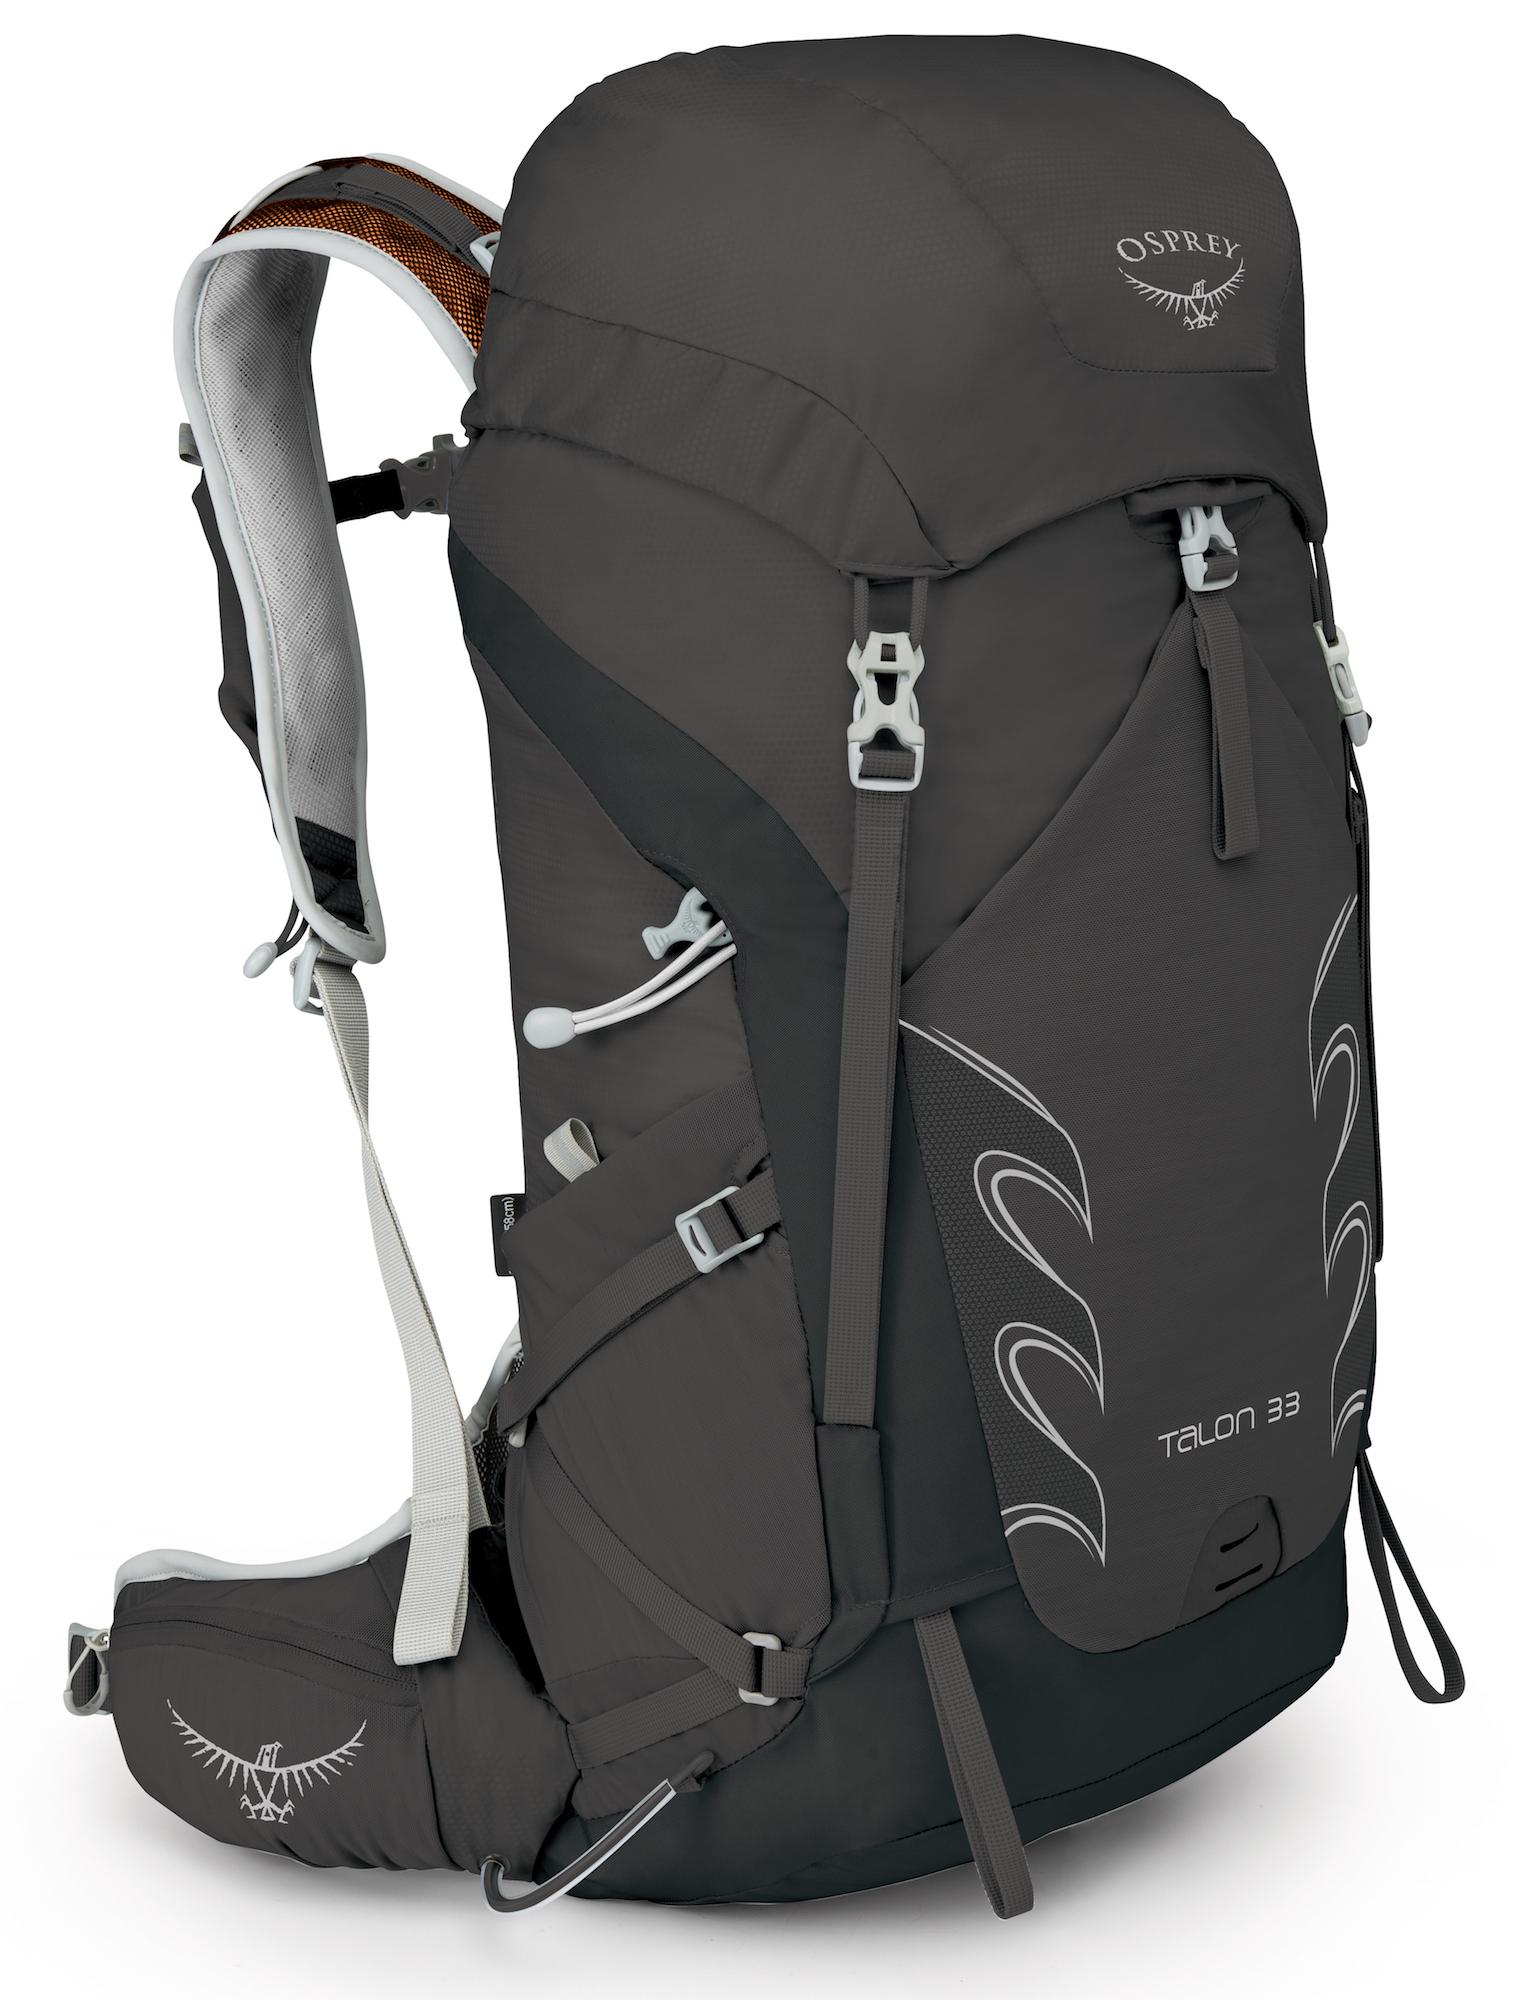 Osprey Talon 33 - Rucksack - Herren